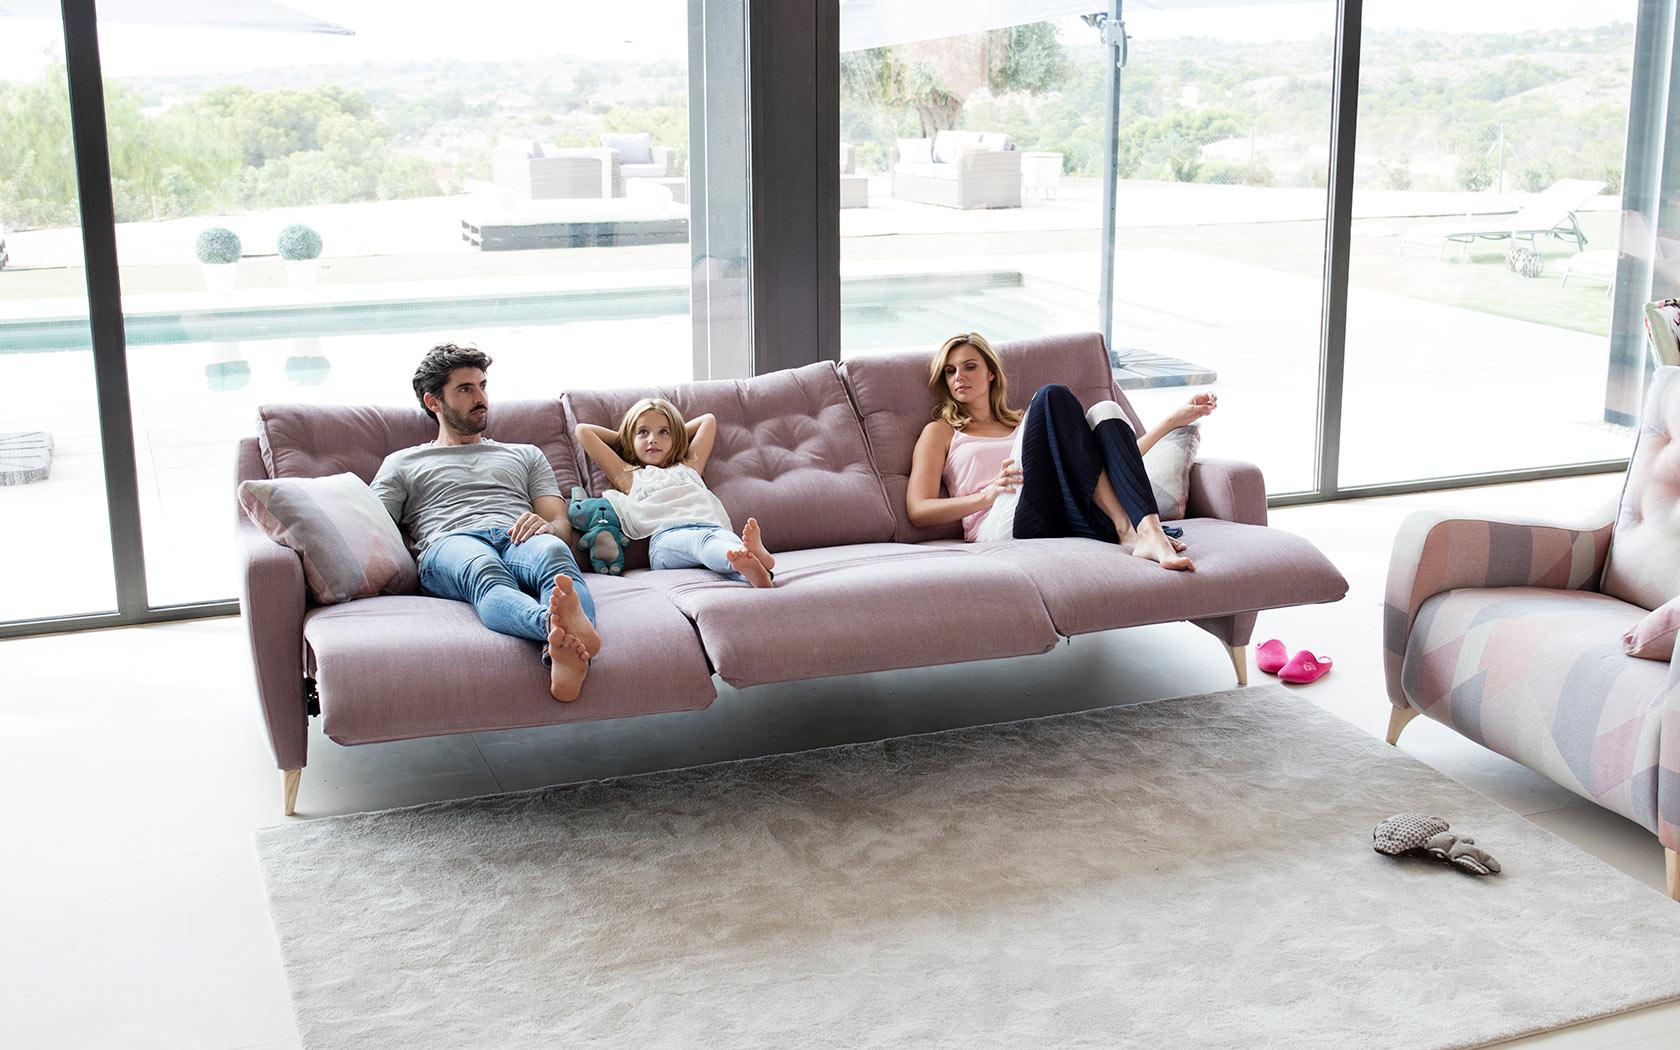 Avalon sofa relax 2019 03